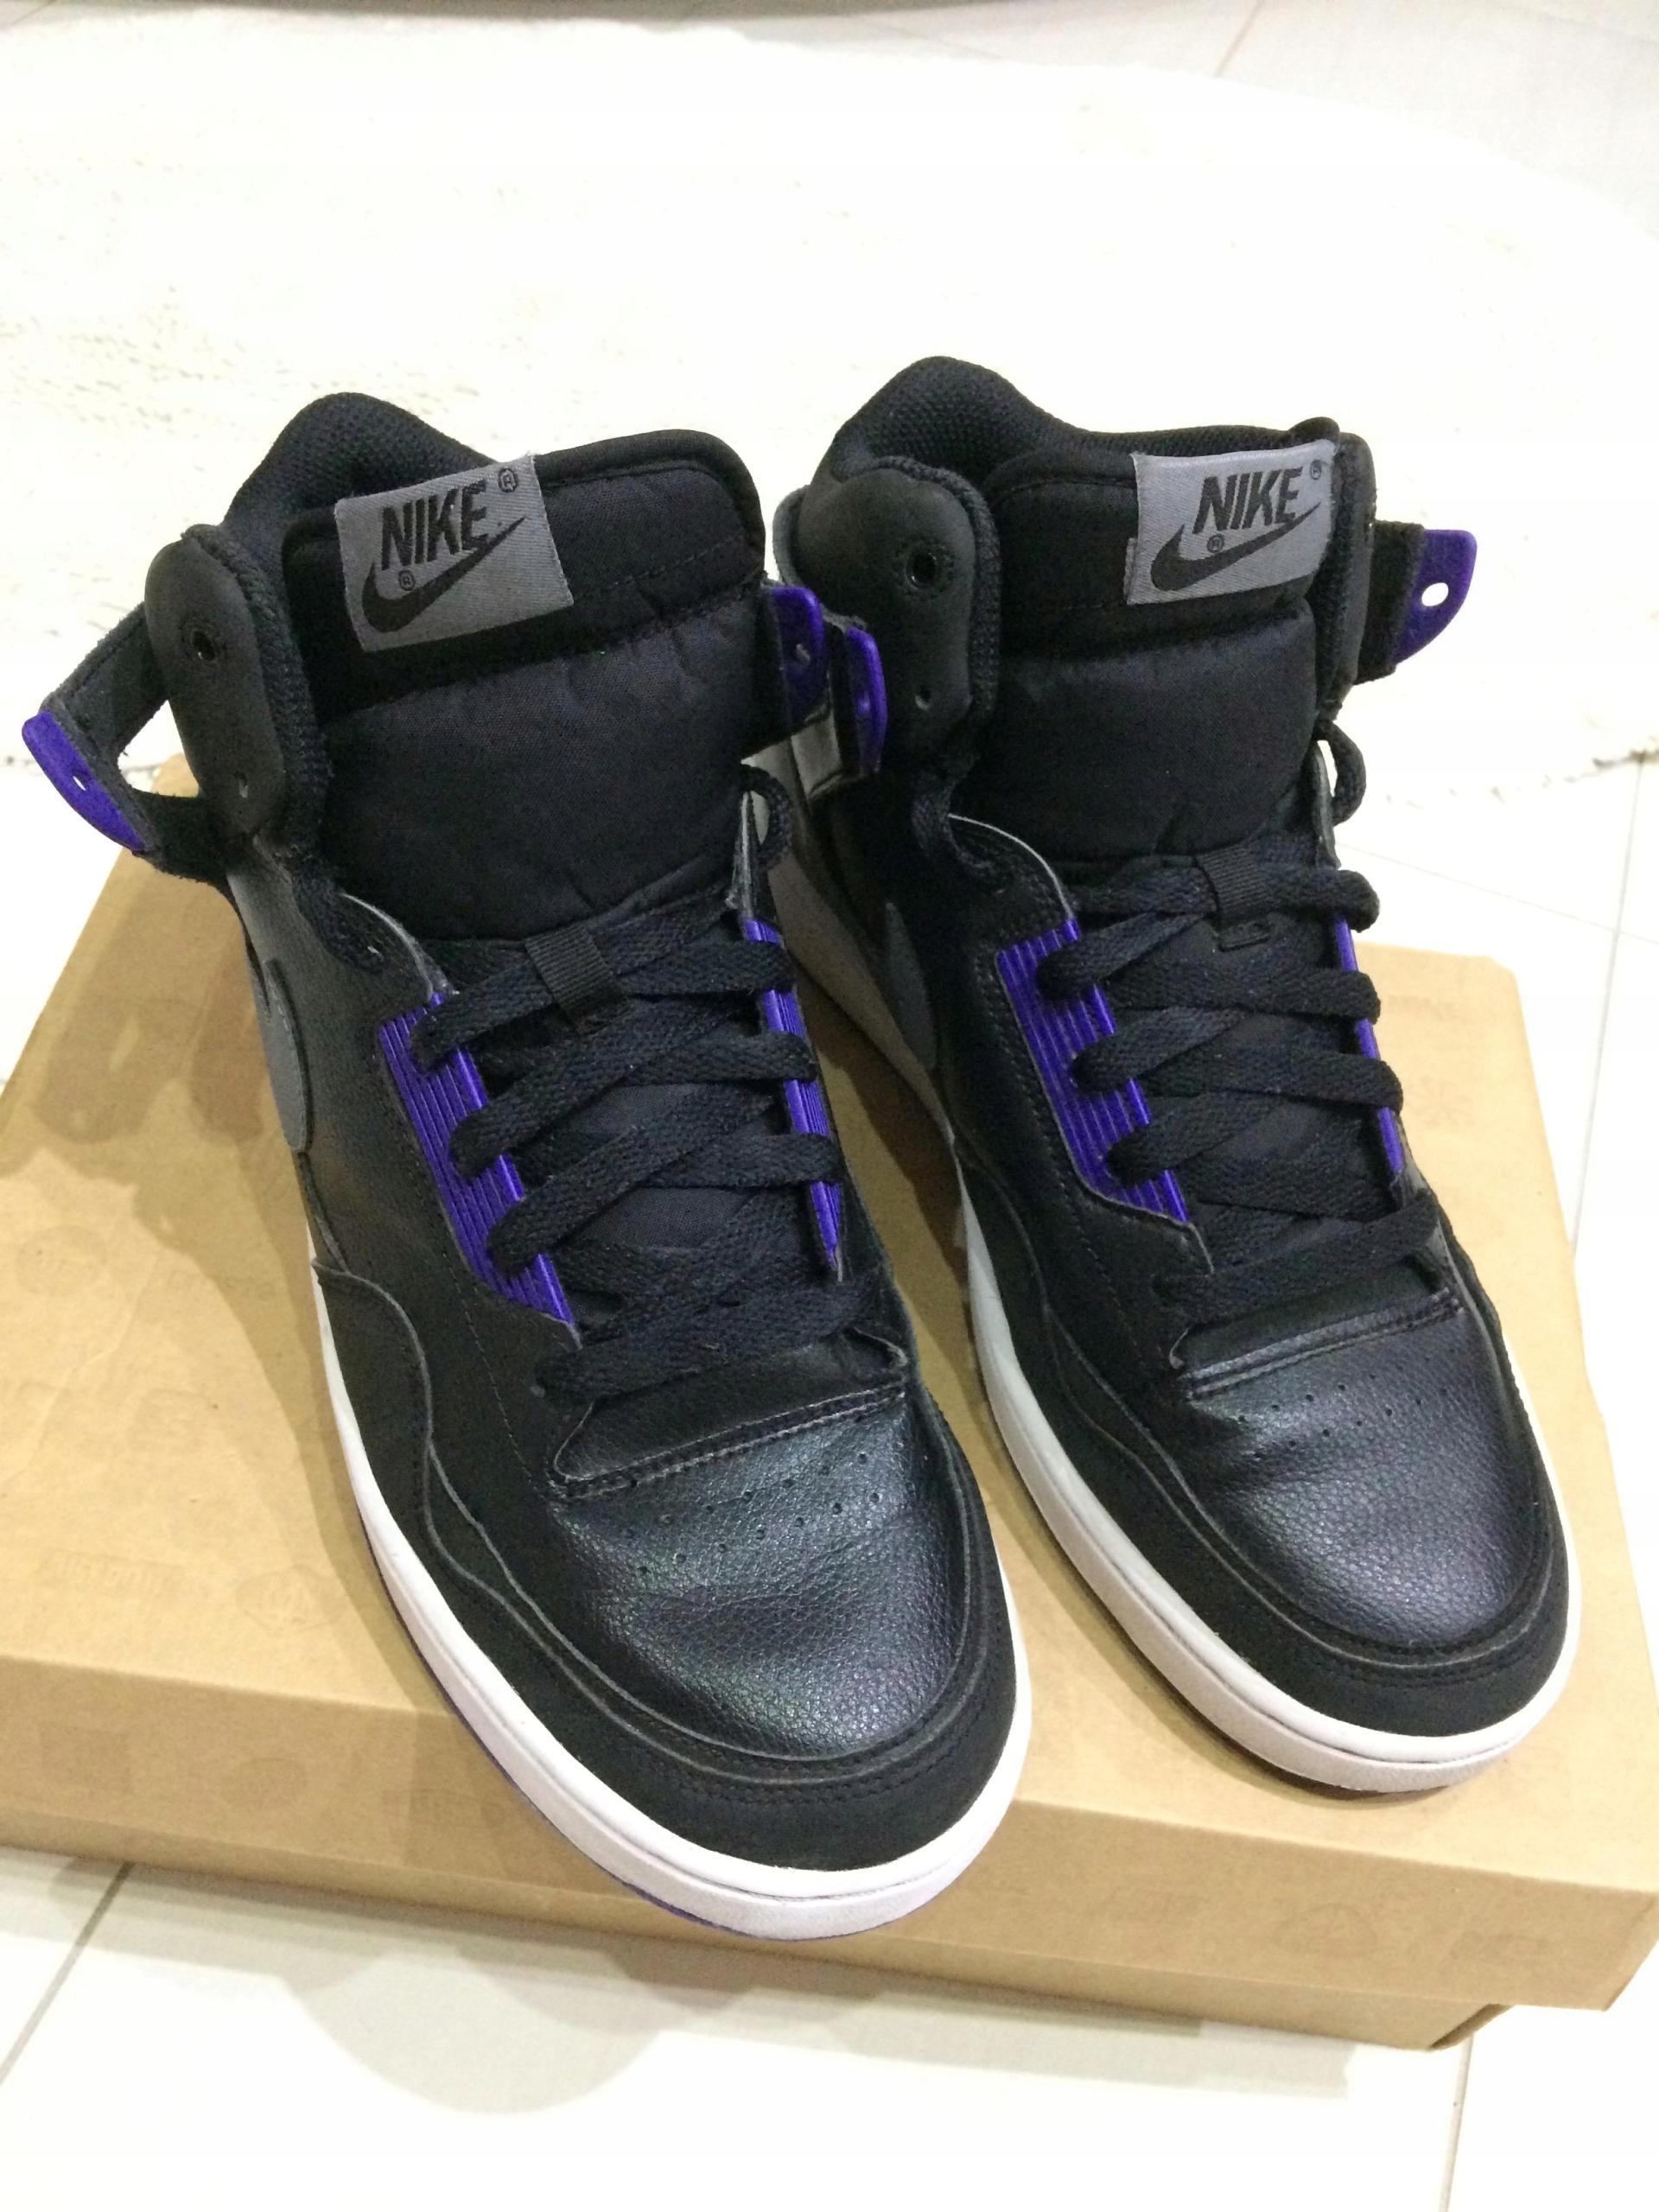 Buty Nike Alphaballer Mid 487858 012 7580809148